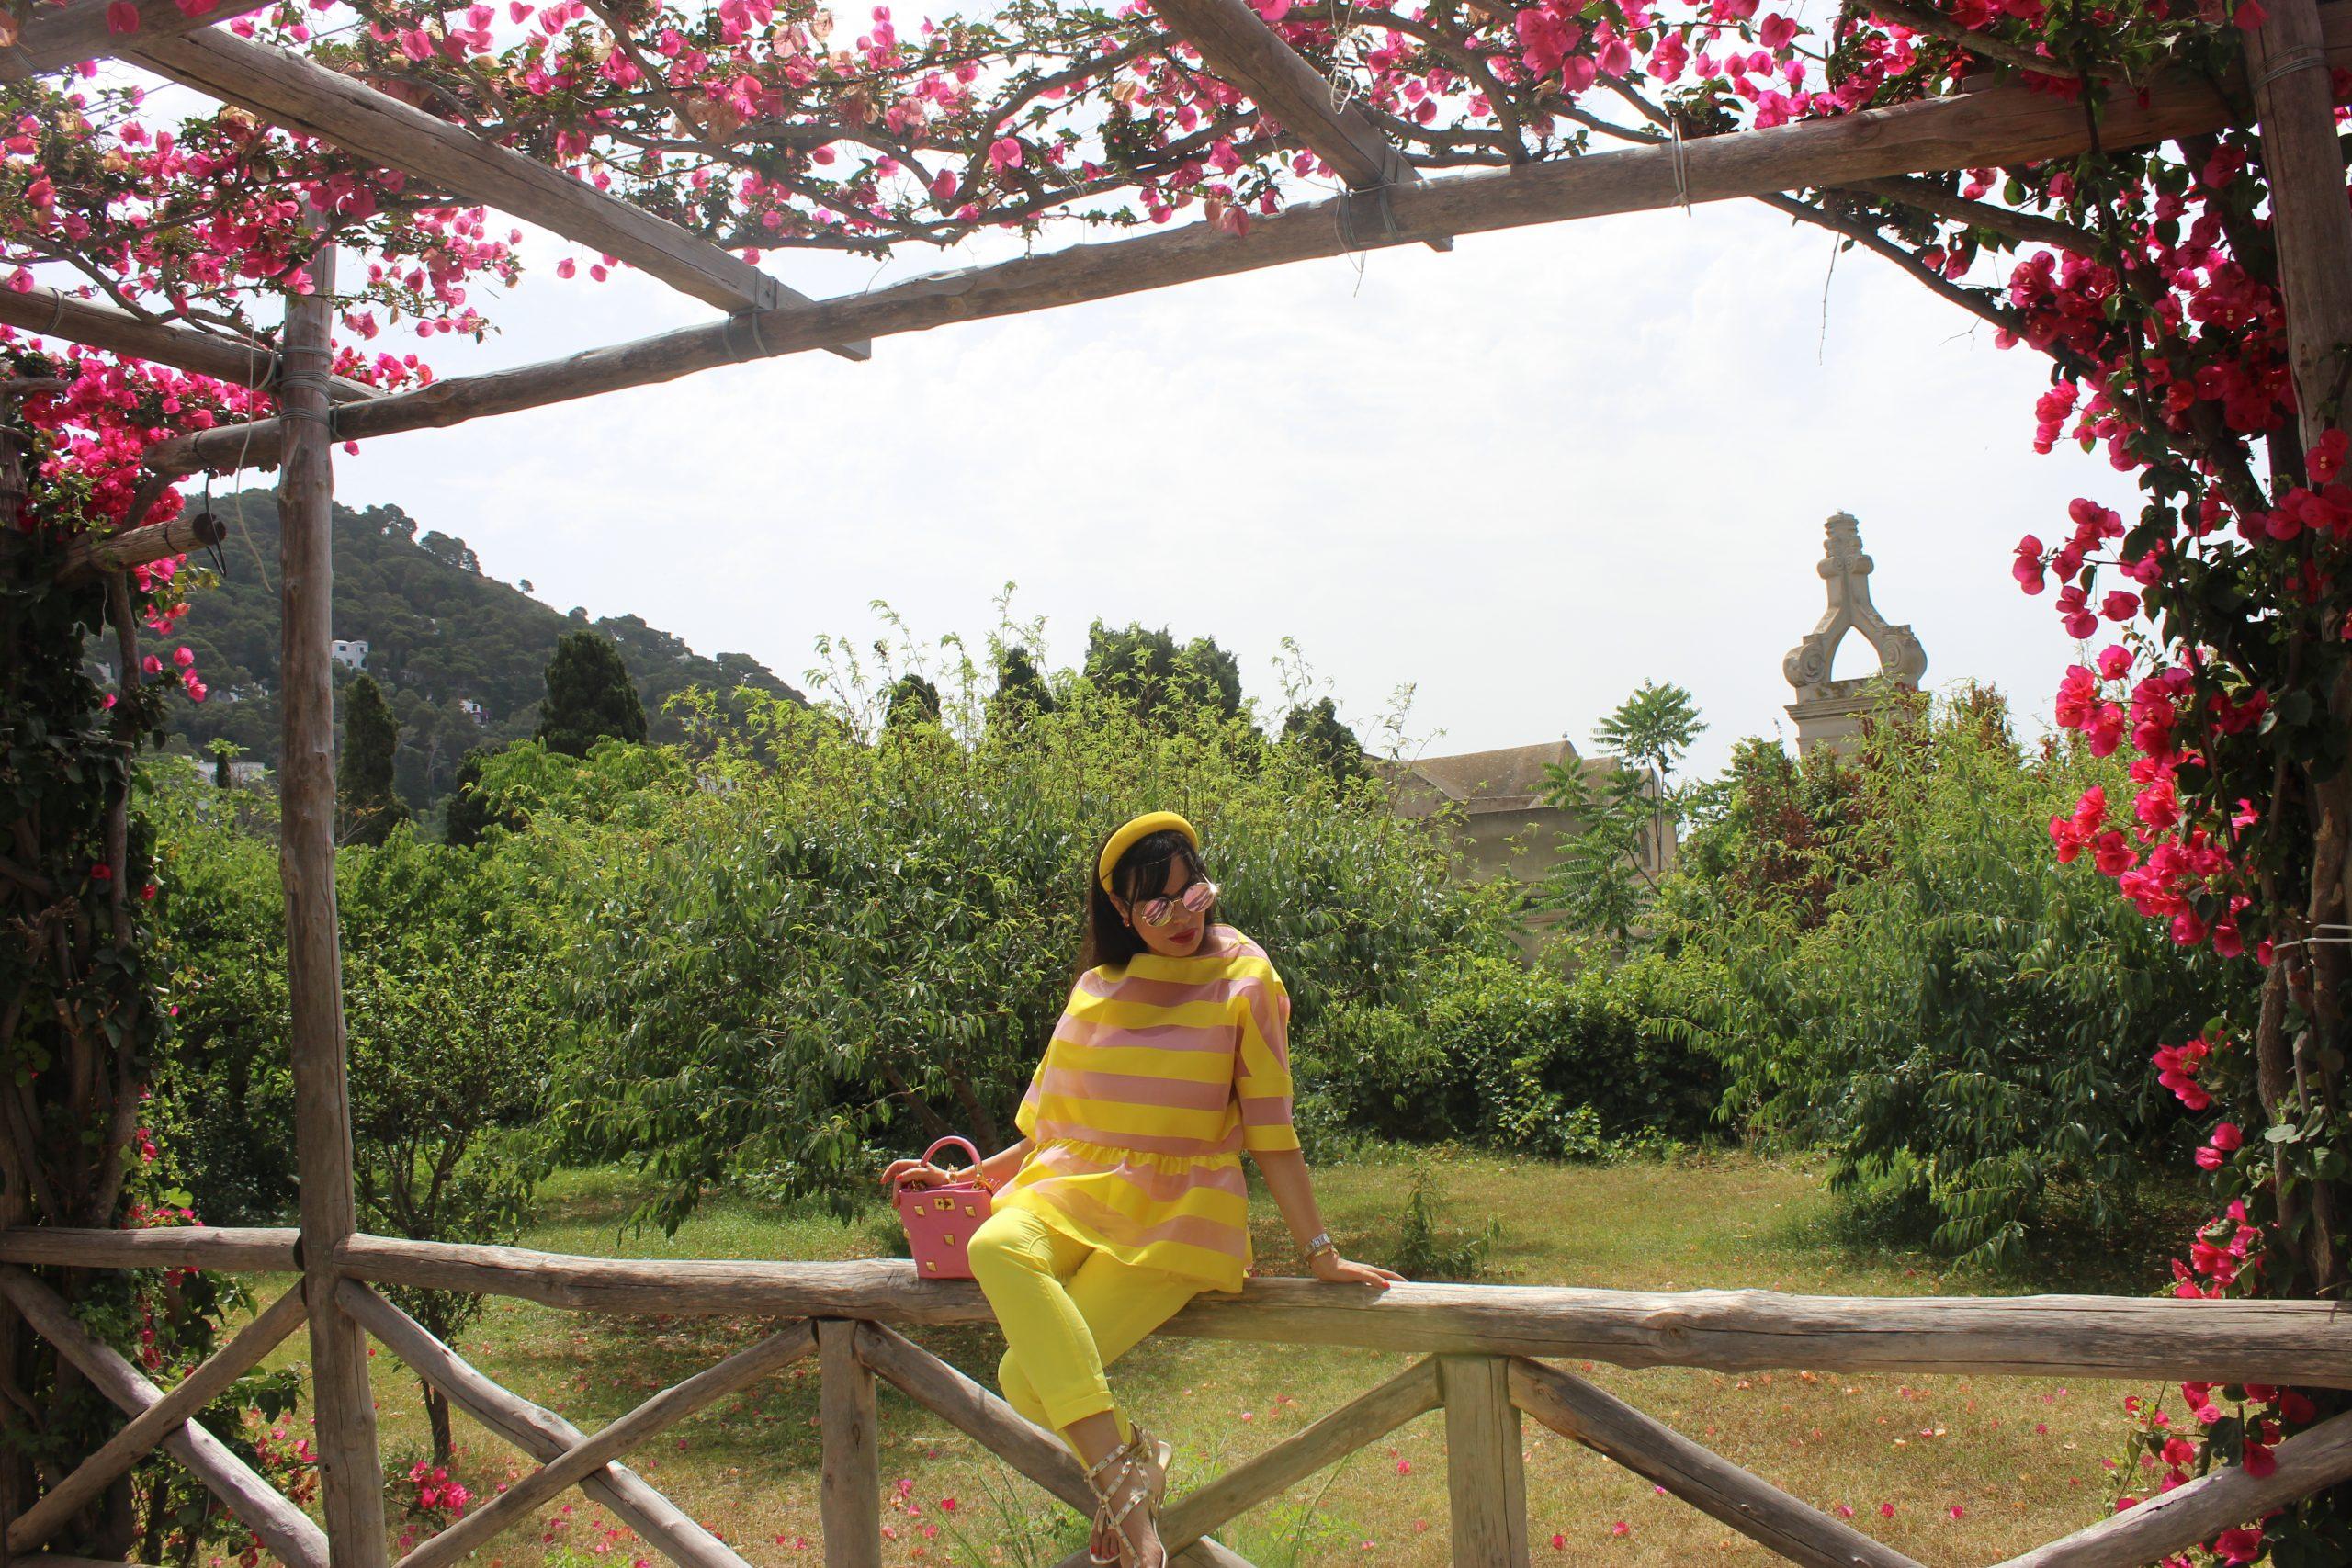 Carthusia Capri Parfume Valentino Yellow Inspo Outfit Italian Summer Staycation Paola Lauretano